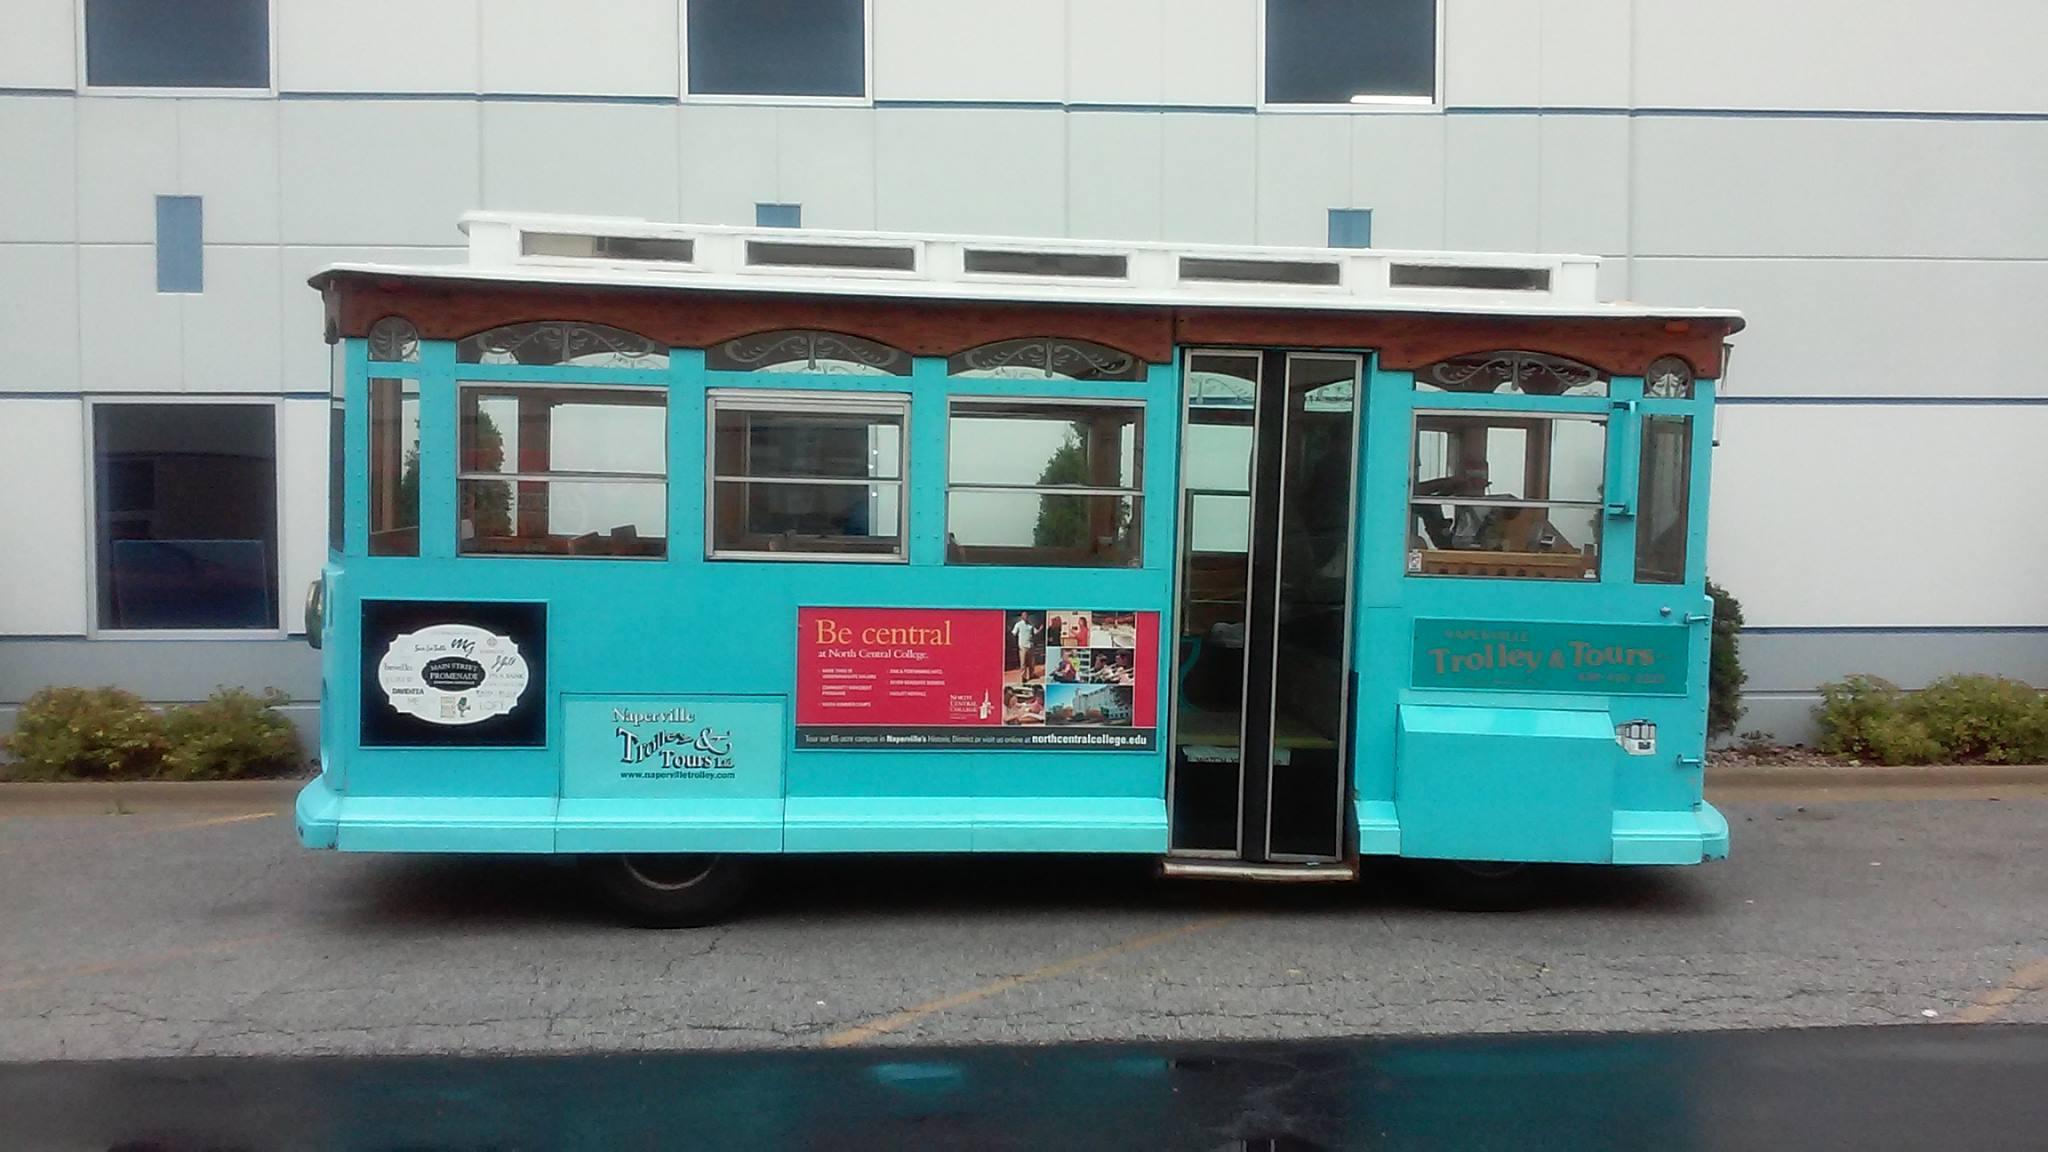 Main Street Promenade trolley ad